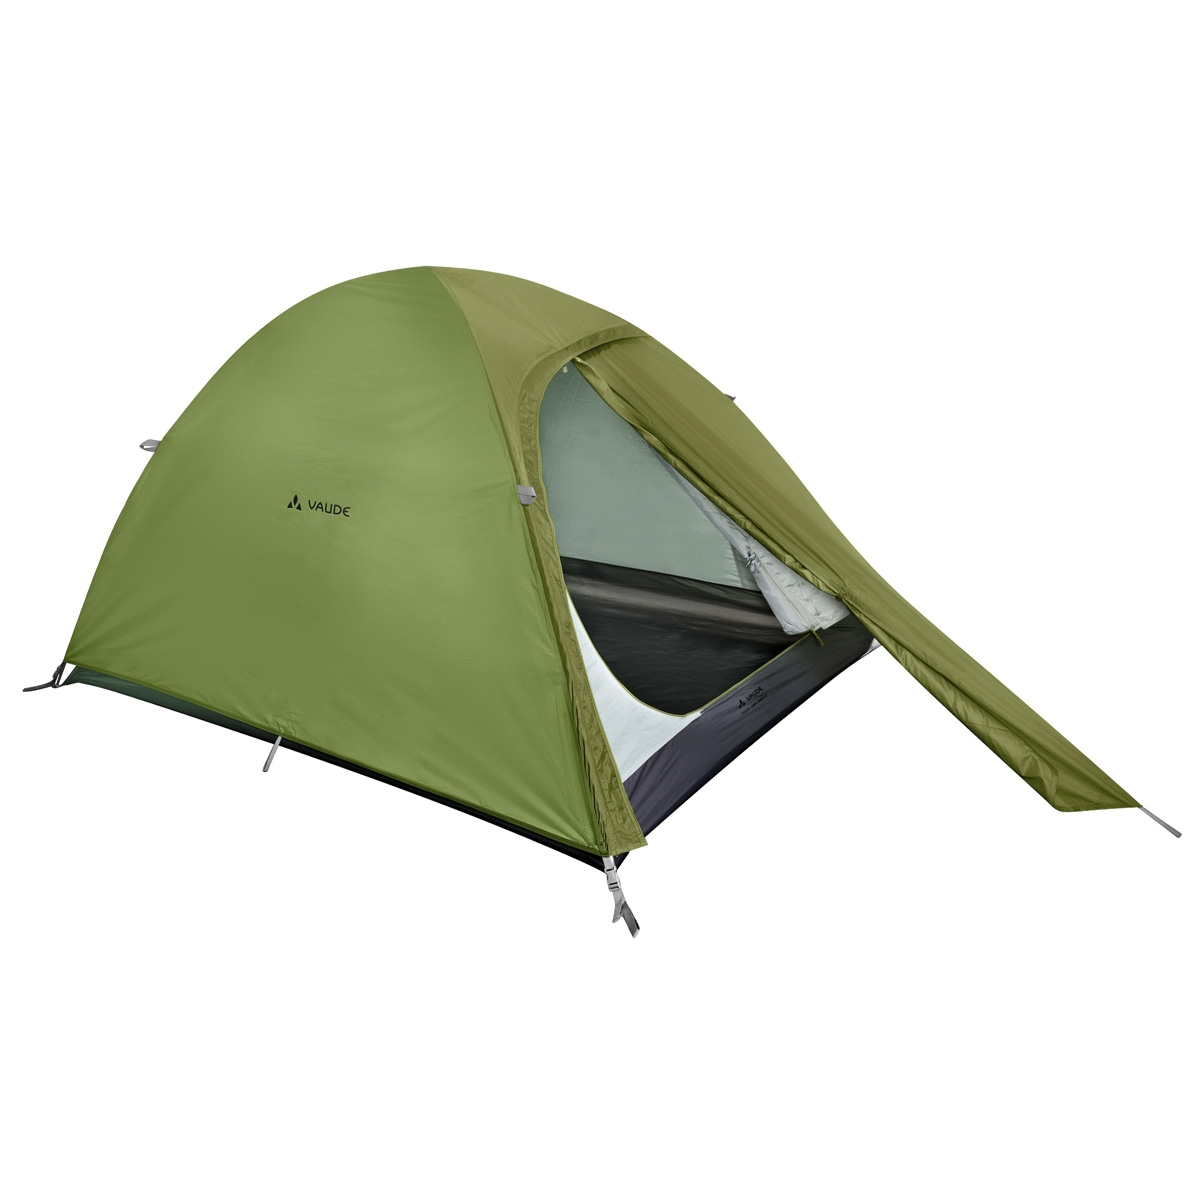 Vaude C&o Compact 2P Tent  sc 1 st  Uttings & Vaude Tents and Bivis | Uttings.co.uk